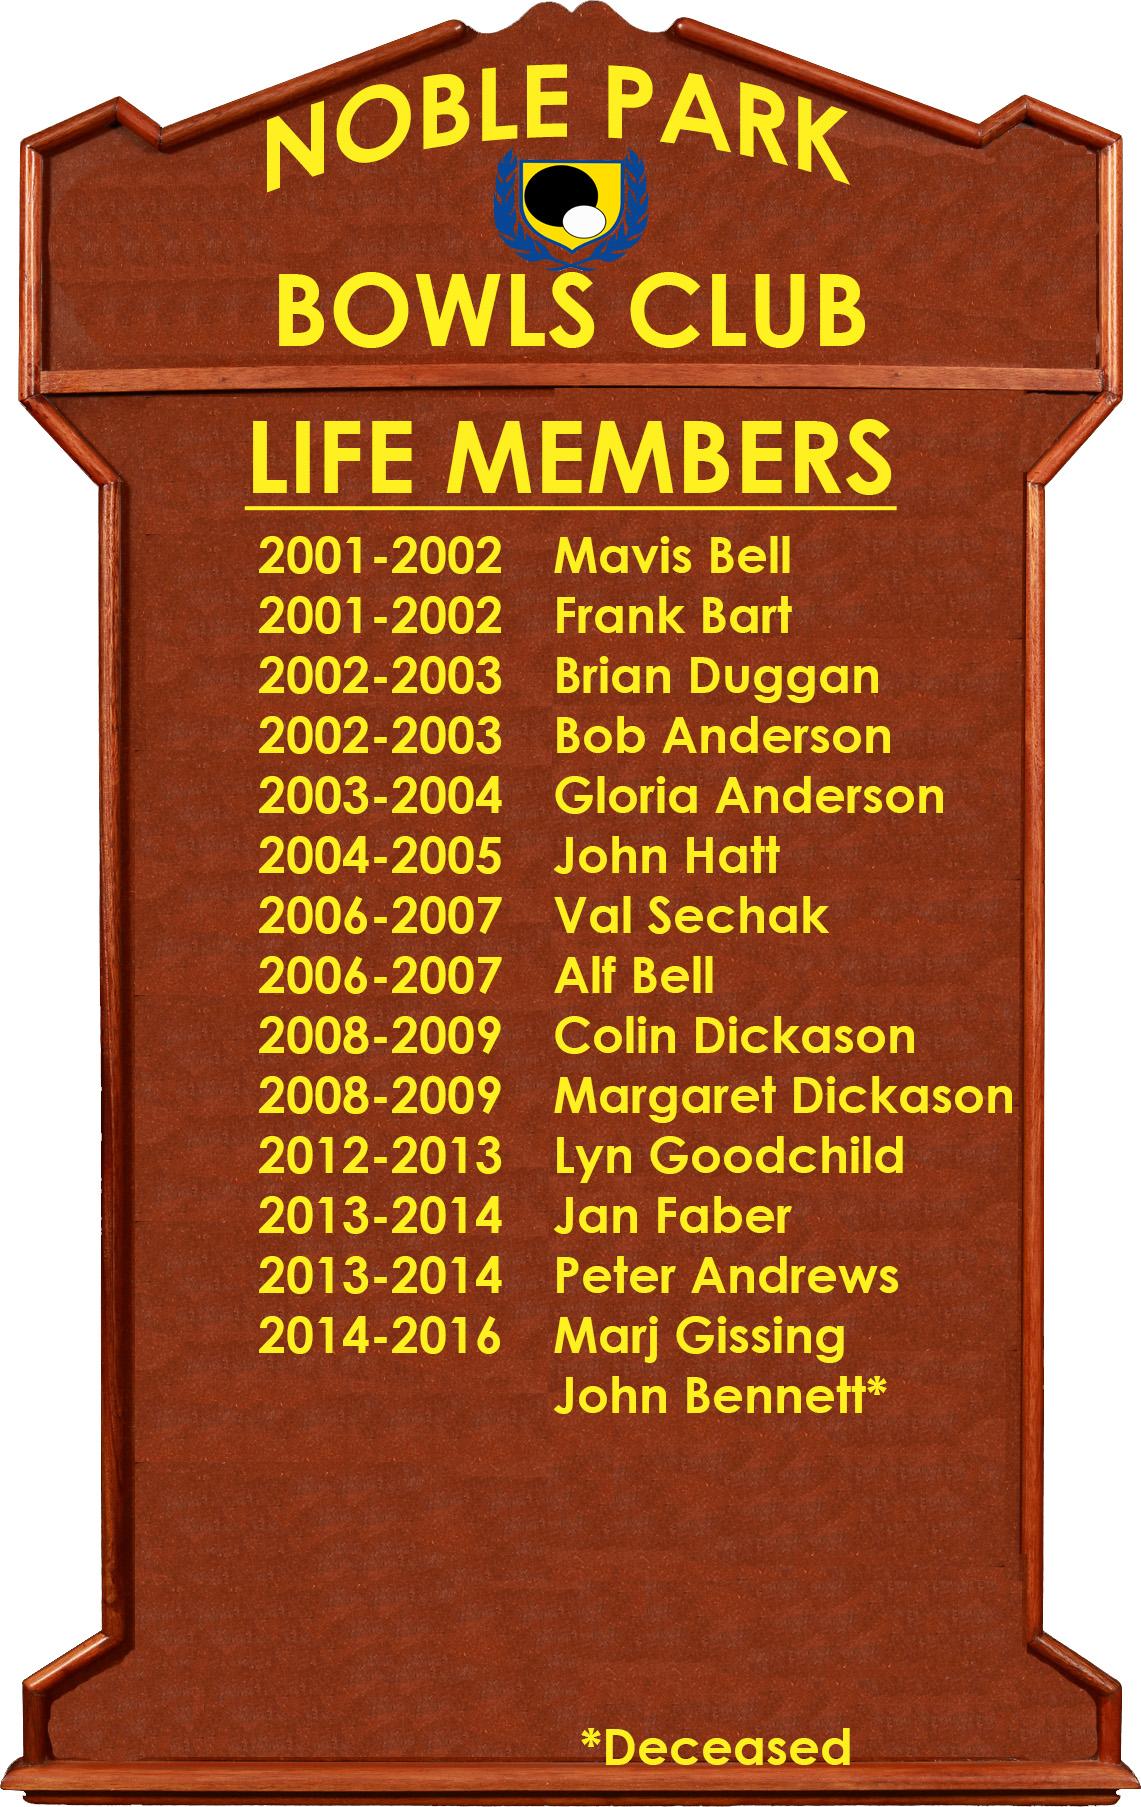 honor board